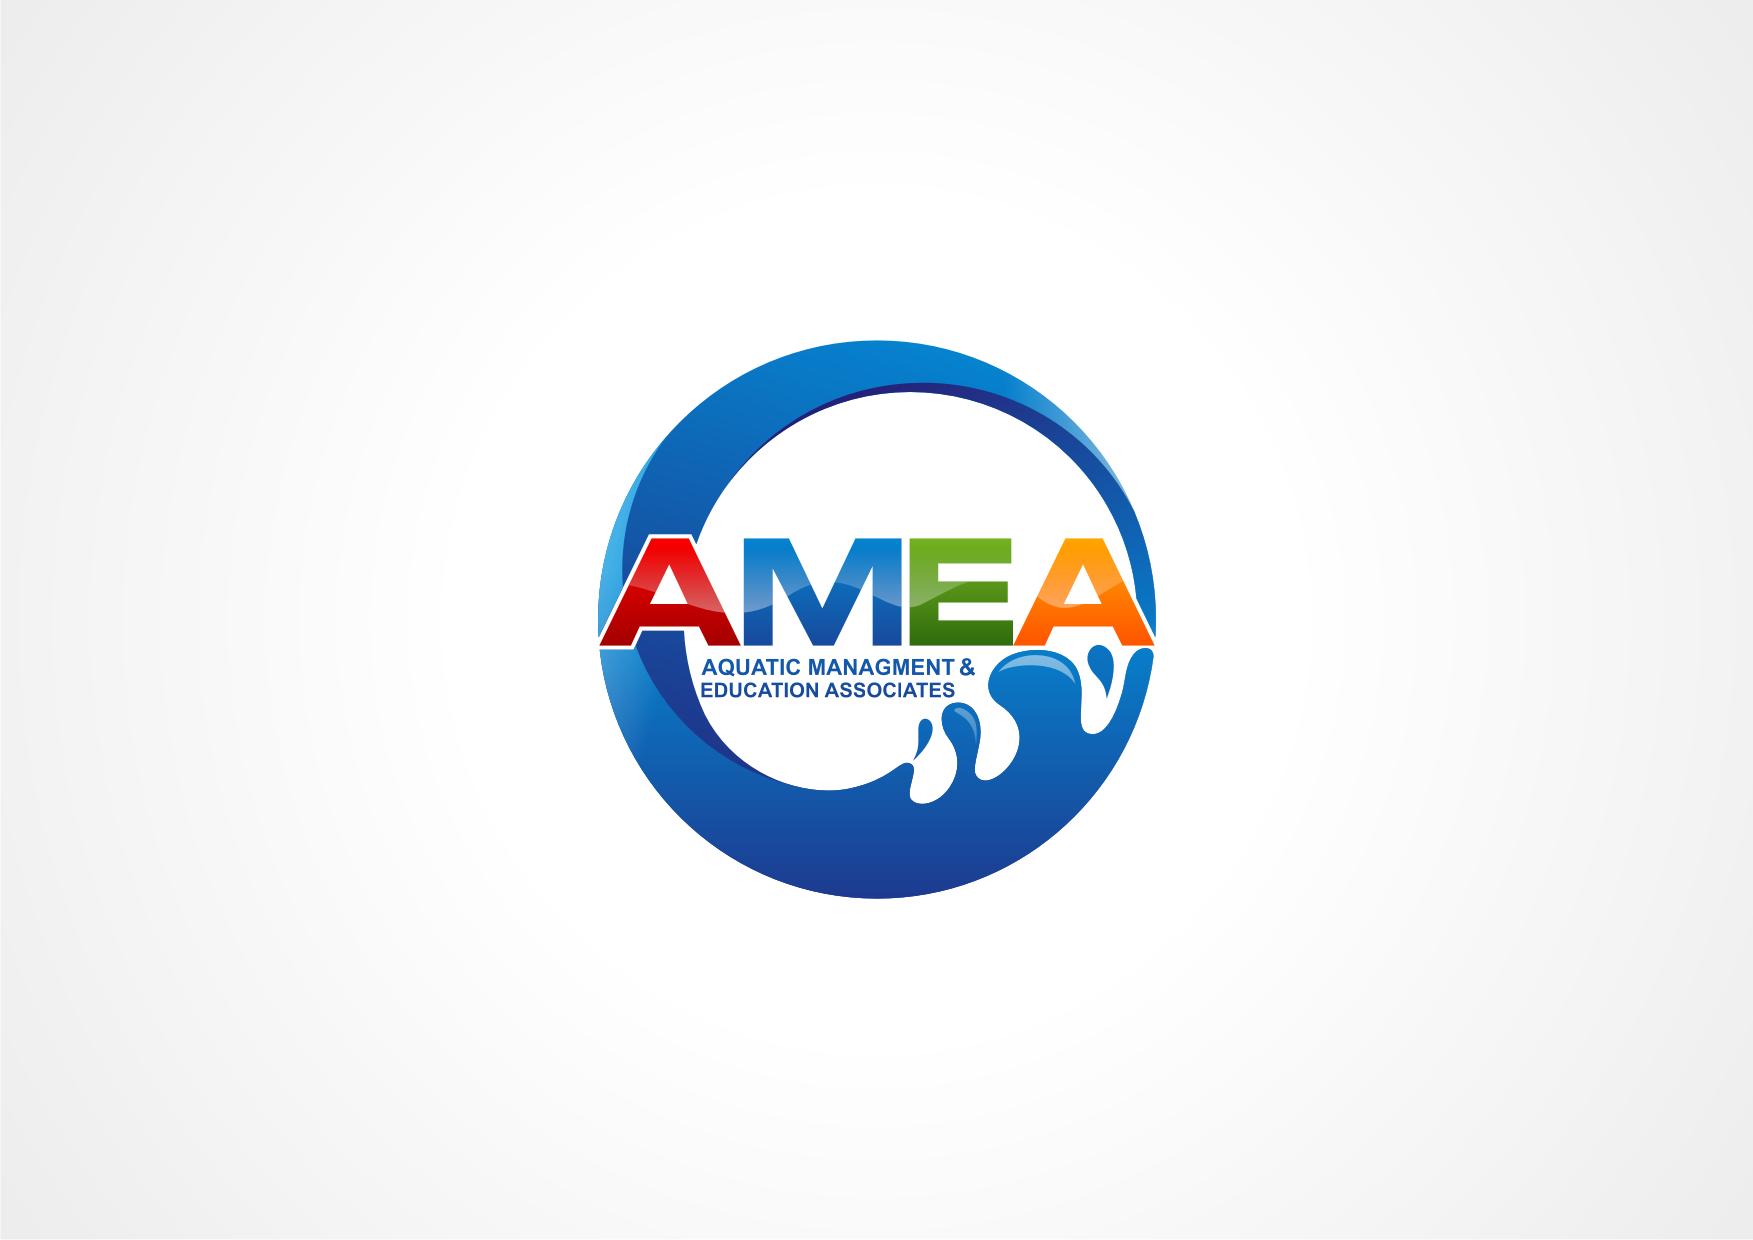 New logo wanted for AMEA - Aquatic Managment & Education Associates